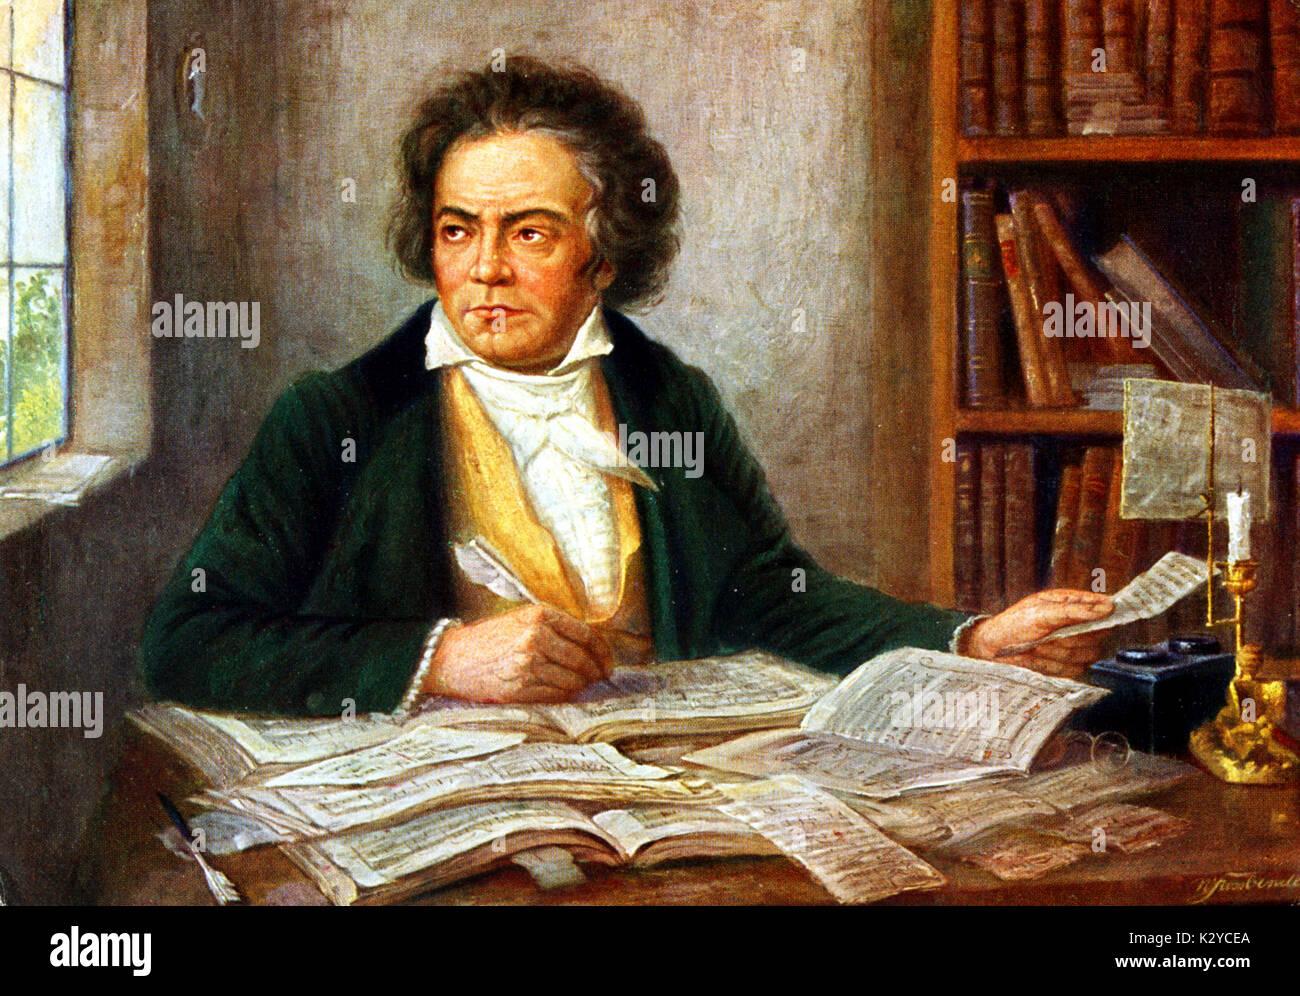 portrait ludwig van beethoven composing stock photos